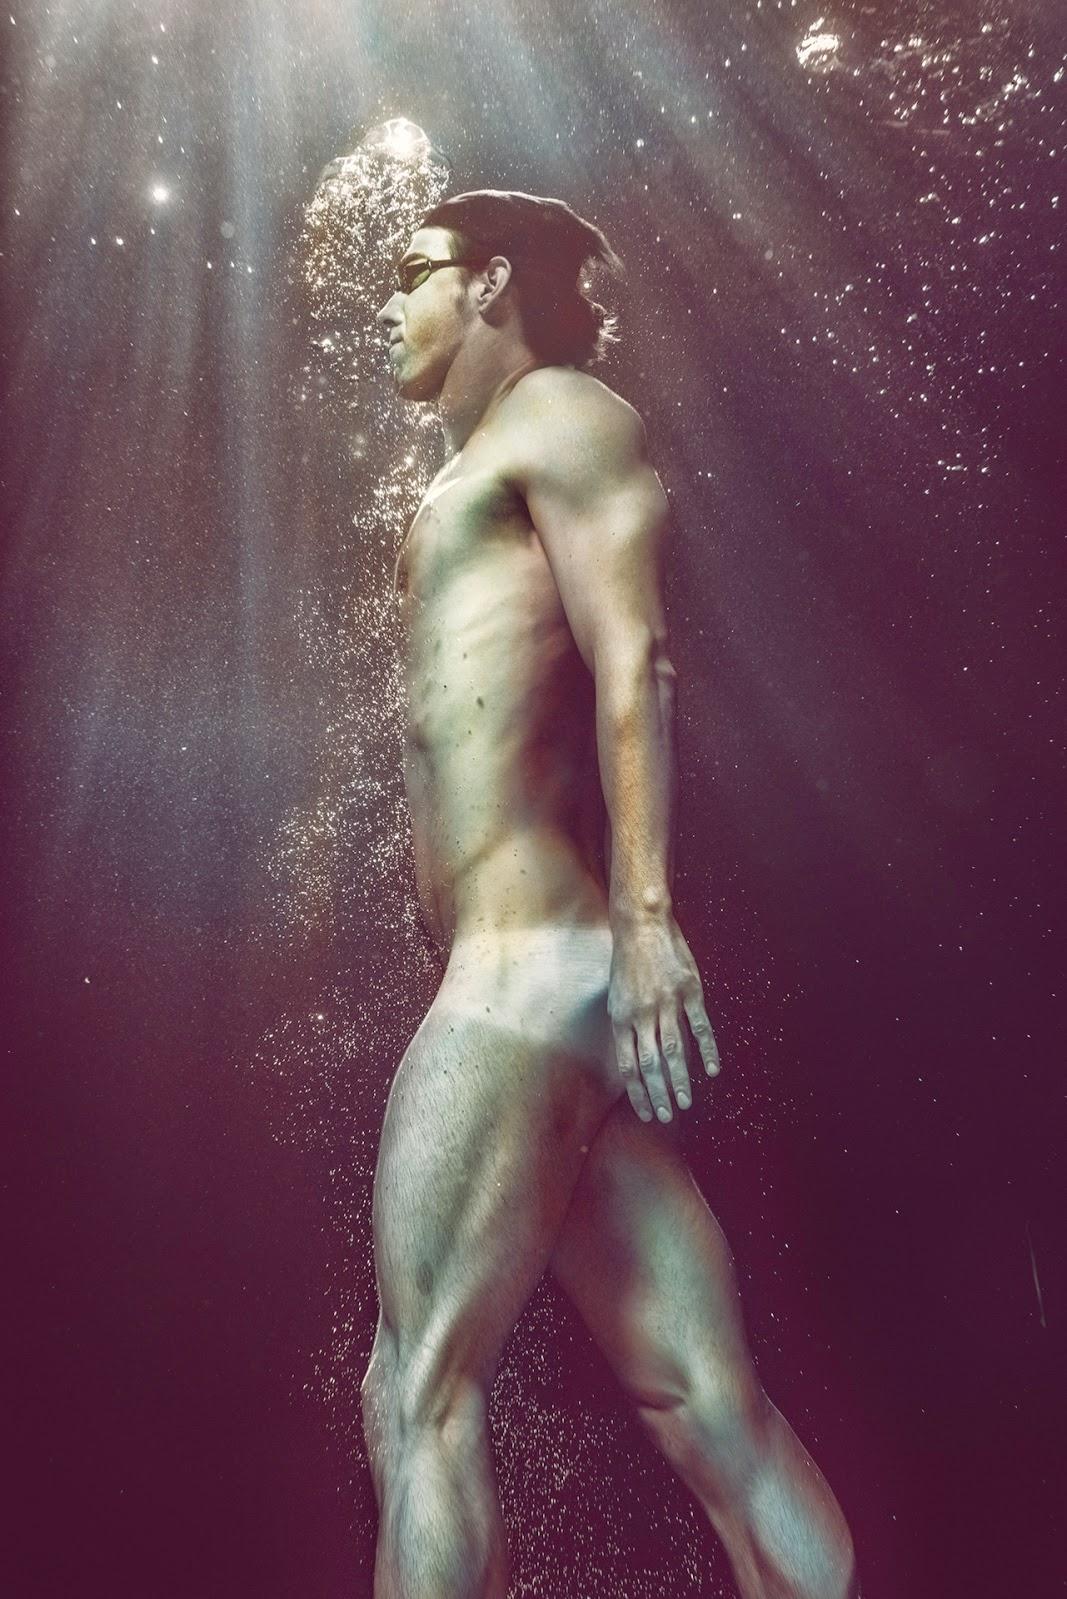 michael phelps naked photos